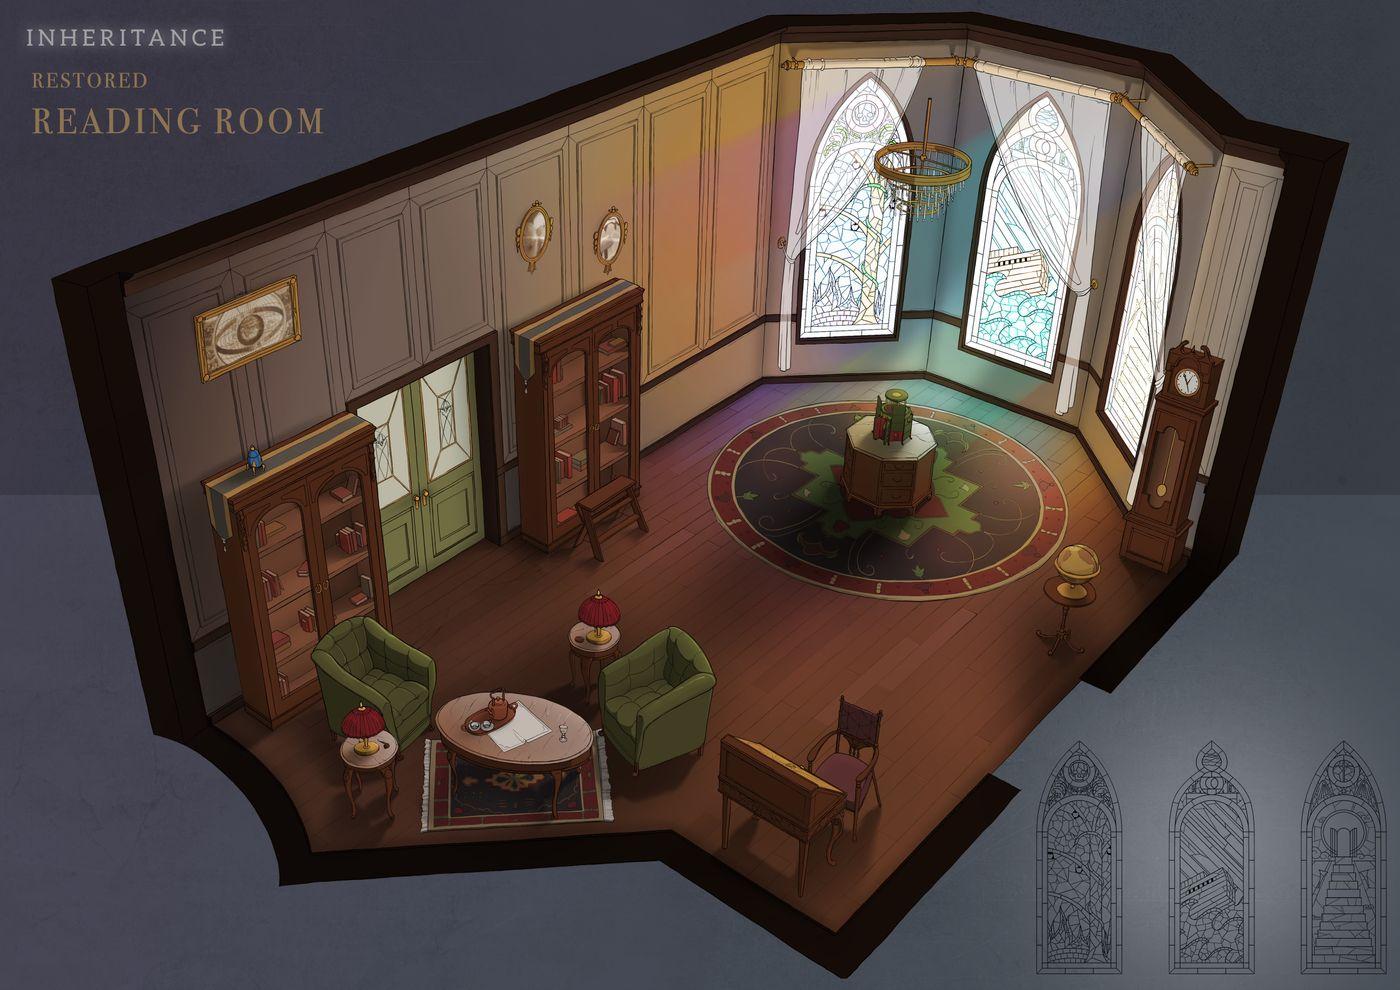 Inheritance Crrdesign.restored Reading Room.chris Rogers.jpg%281%29